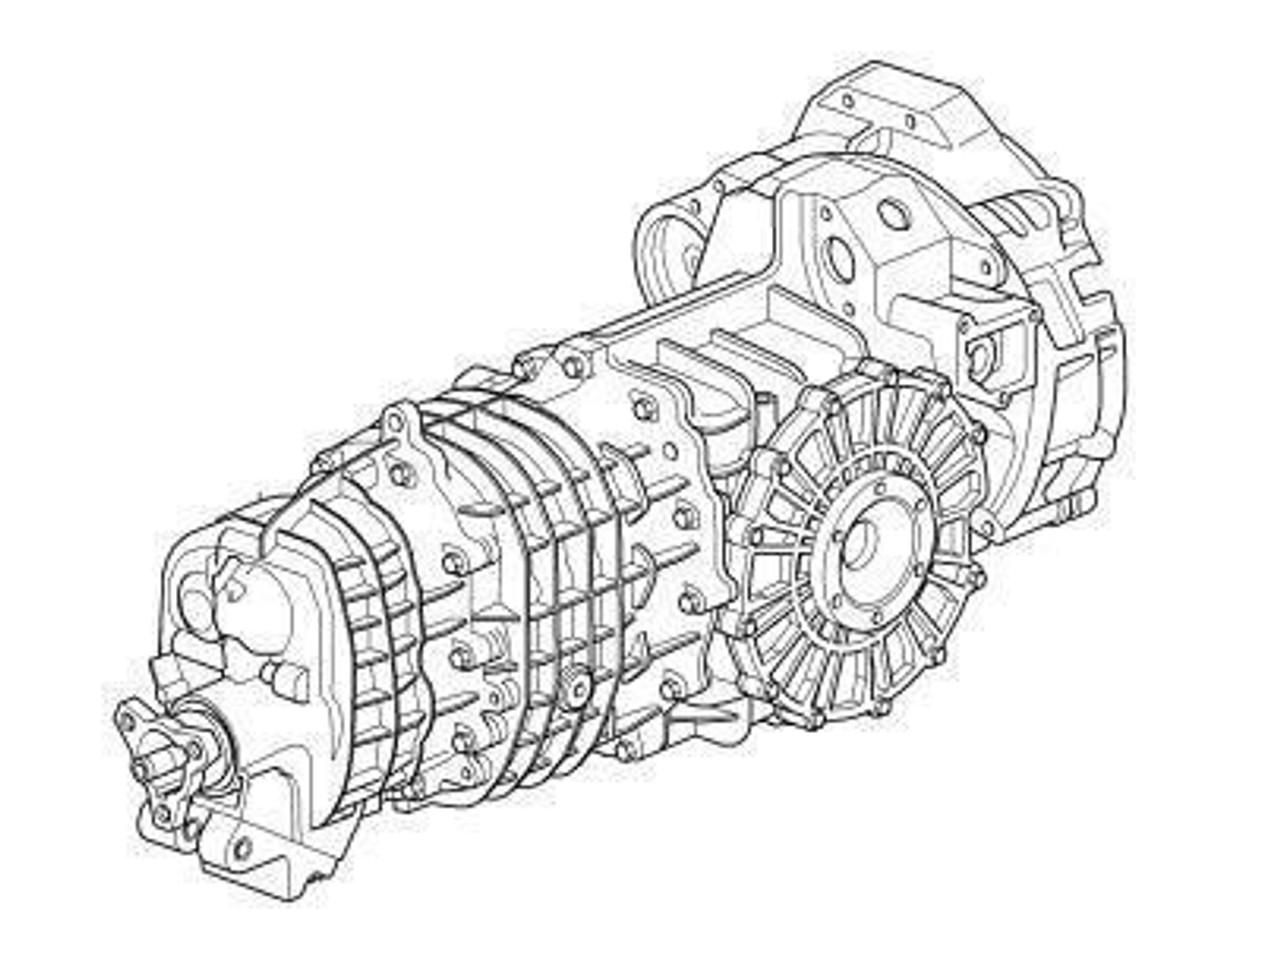 Porsche 911 997 997TT Turbo Manual Transmission G97.50